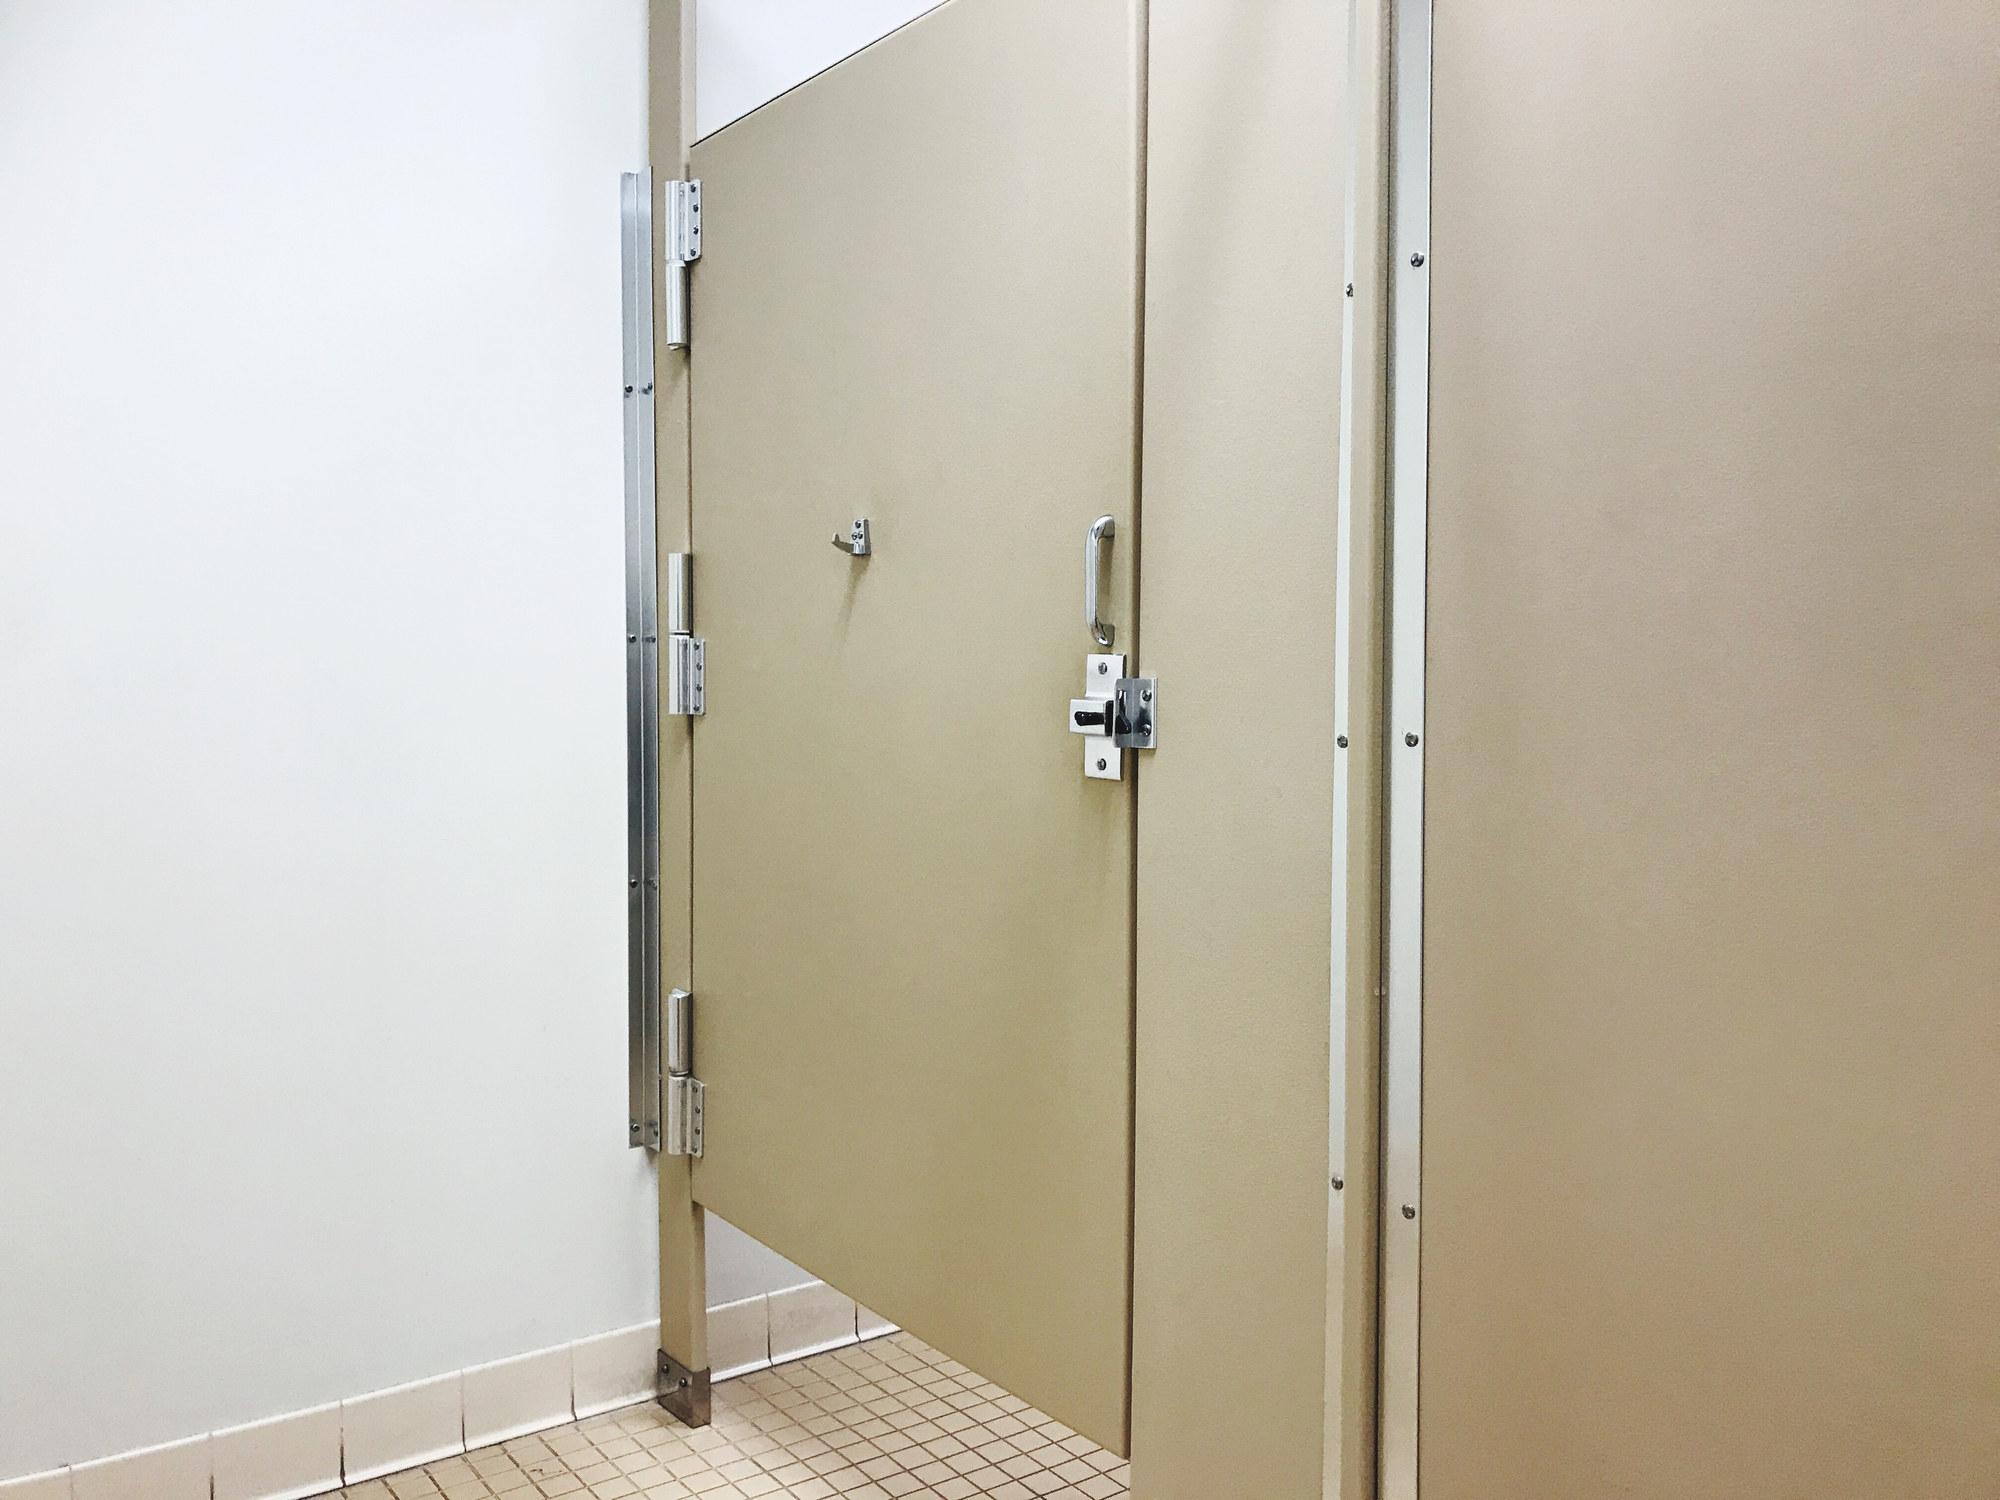 Public bathroom stalls with large gaps.